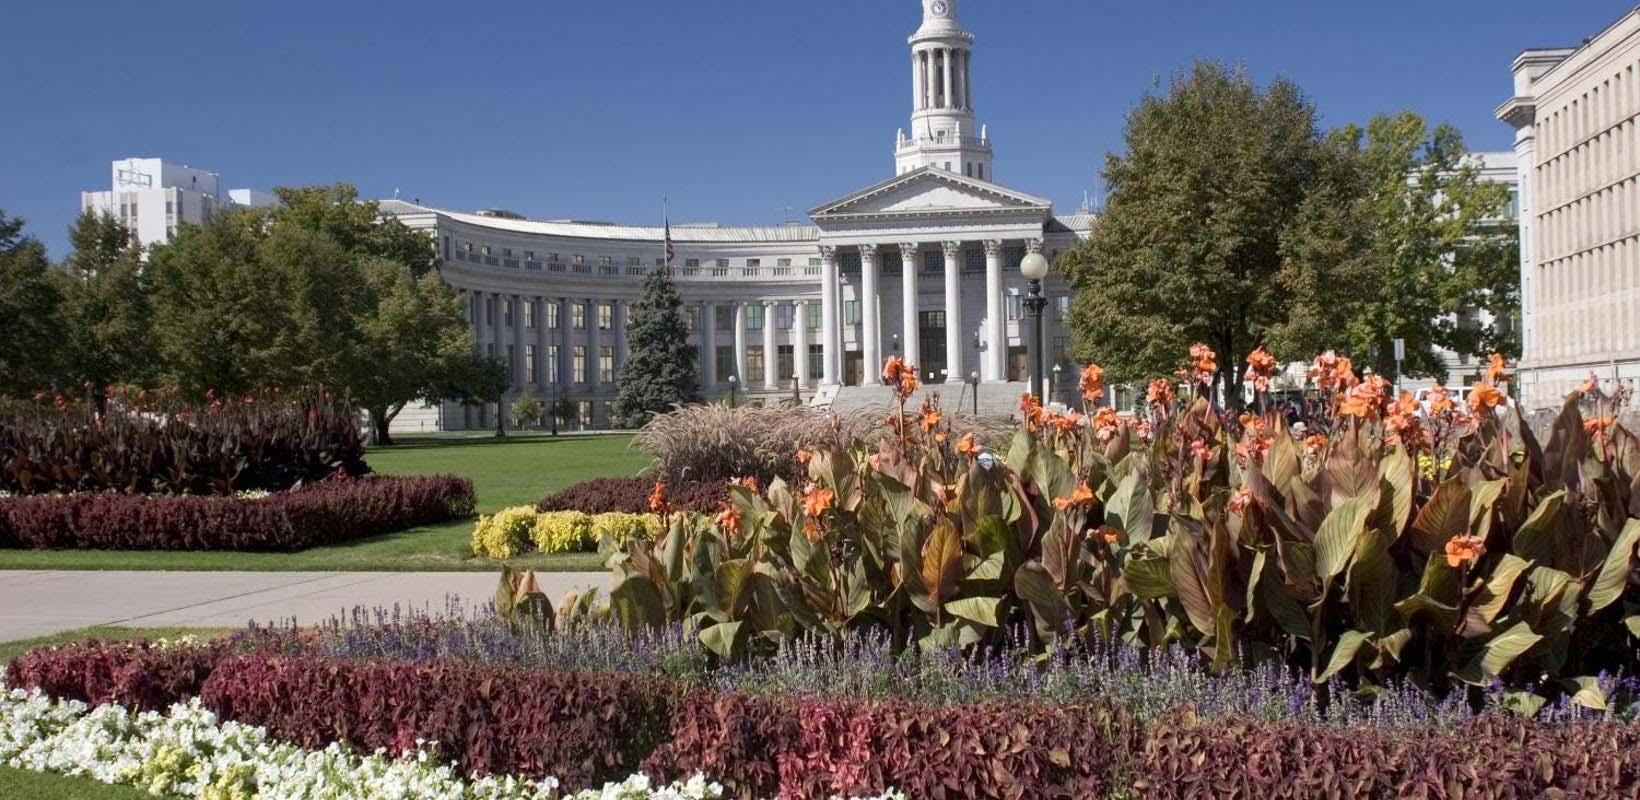 Mountain parks and Denver city tour combo